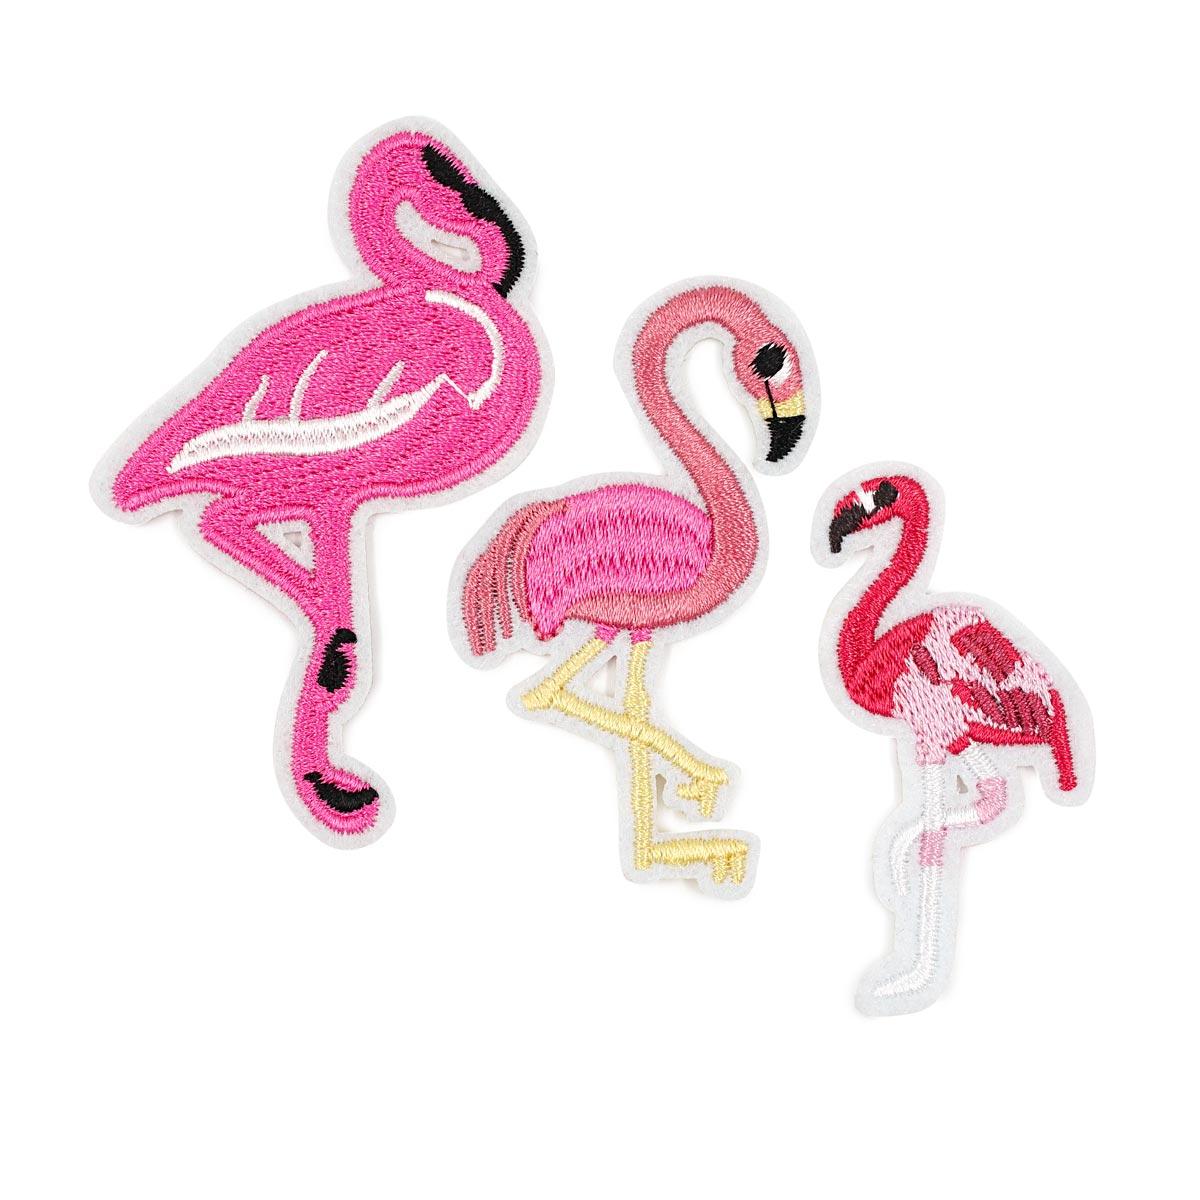 3579251 Наборы термоаппликация фламинго 3шт